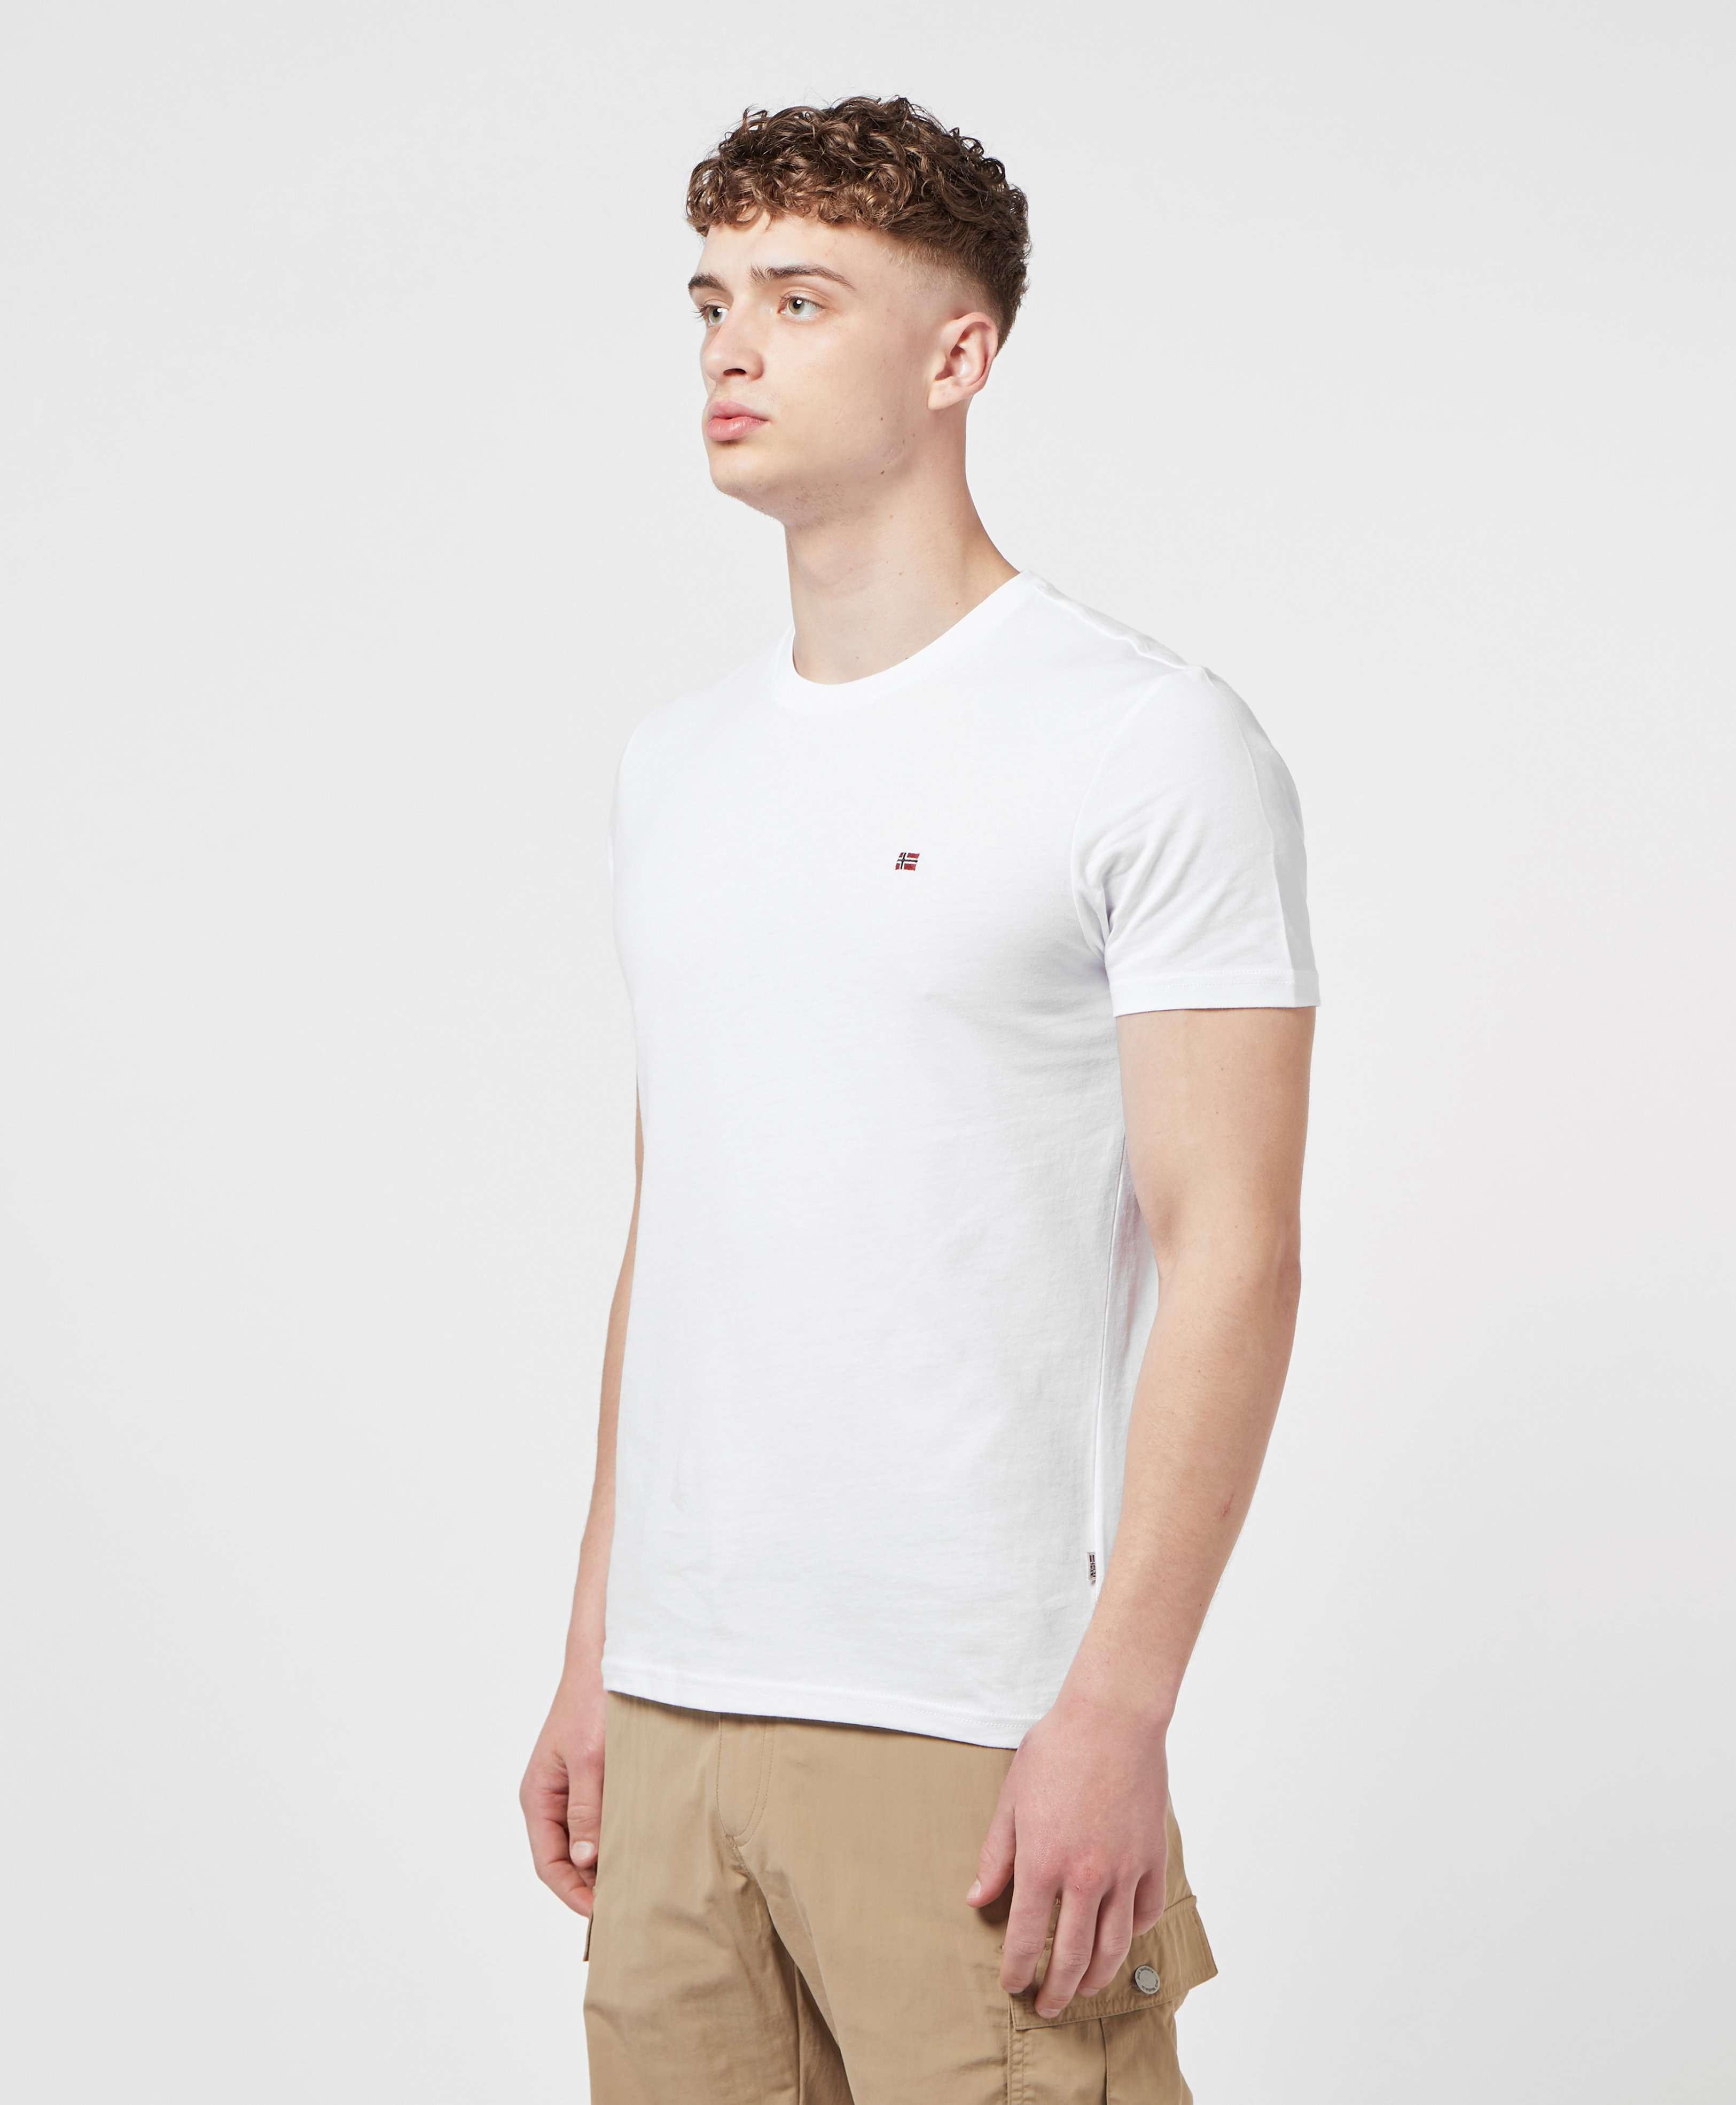 Napapijri Small Flag Short Sleeve T-Shirt